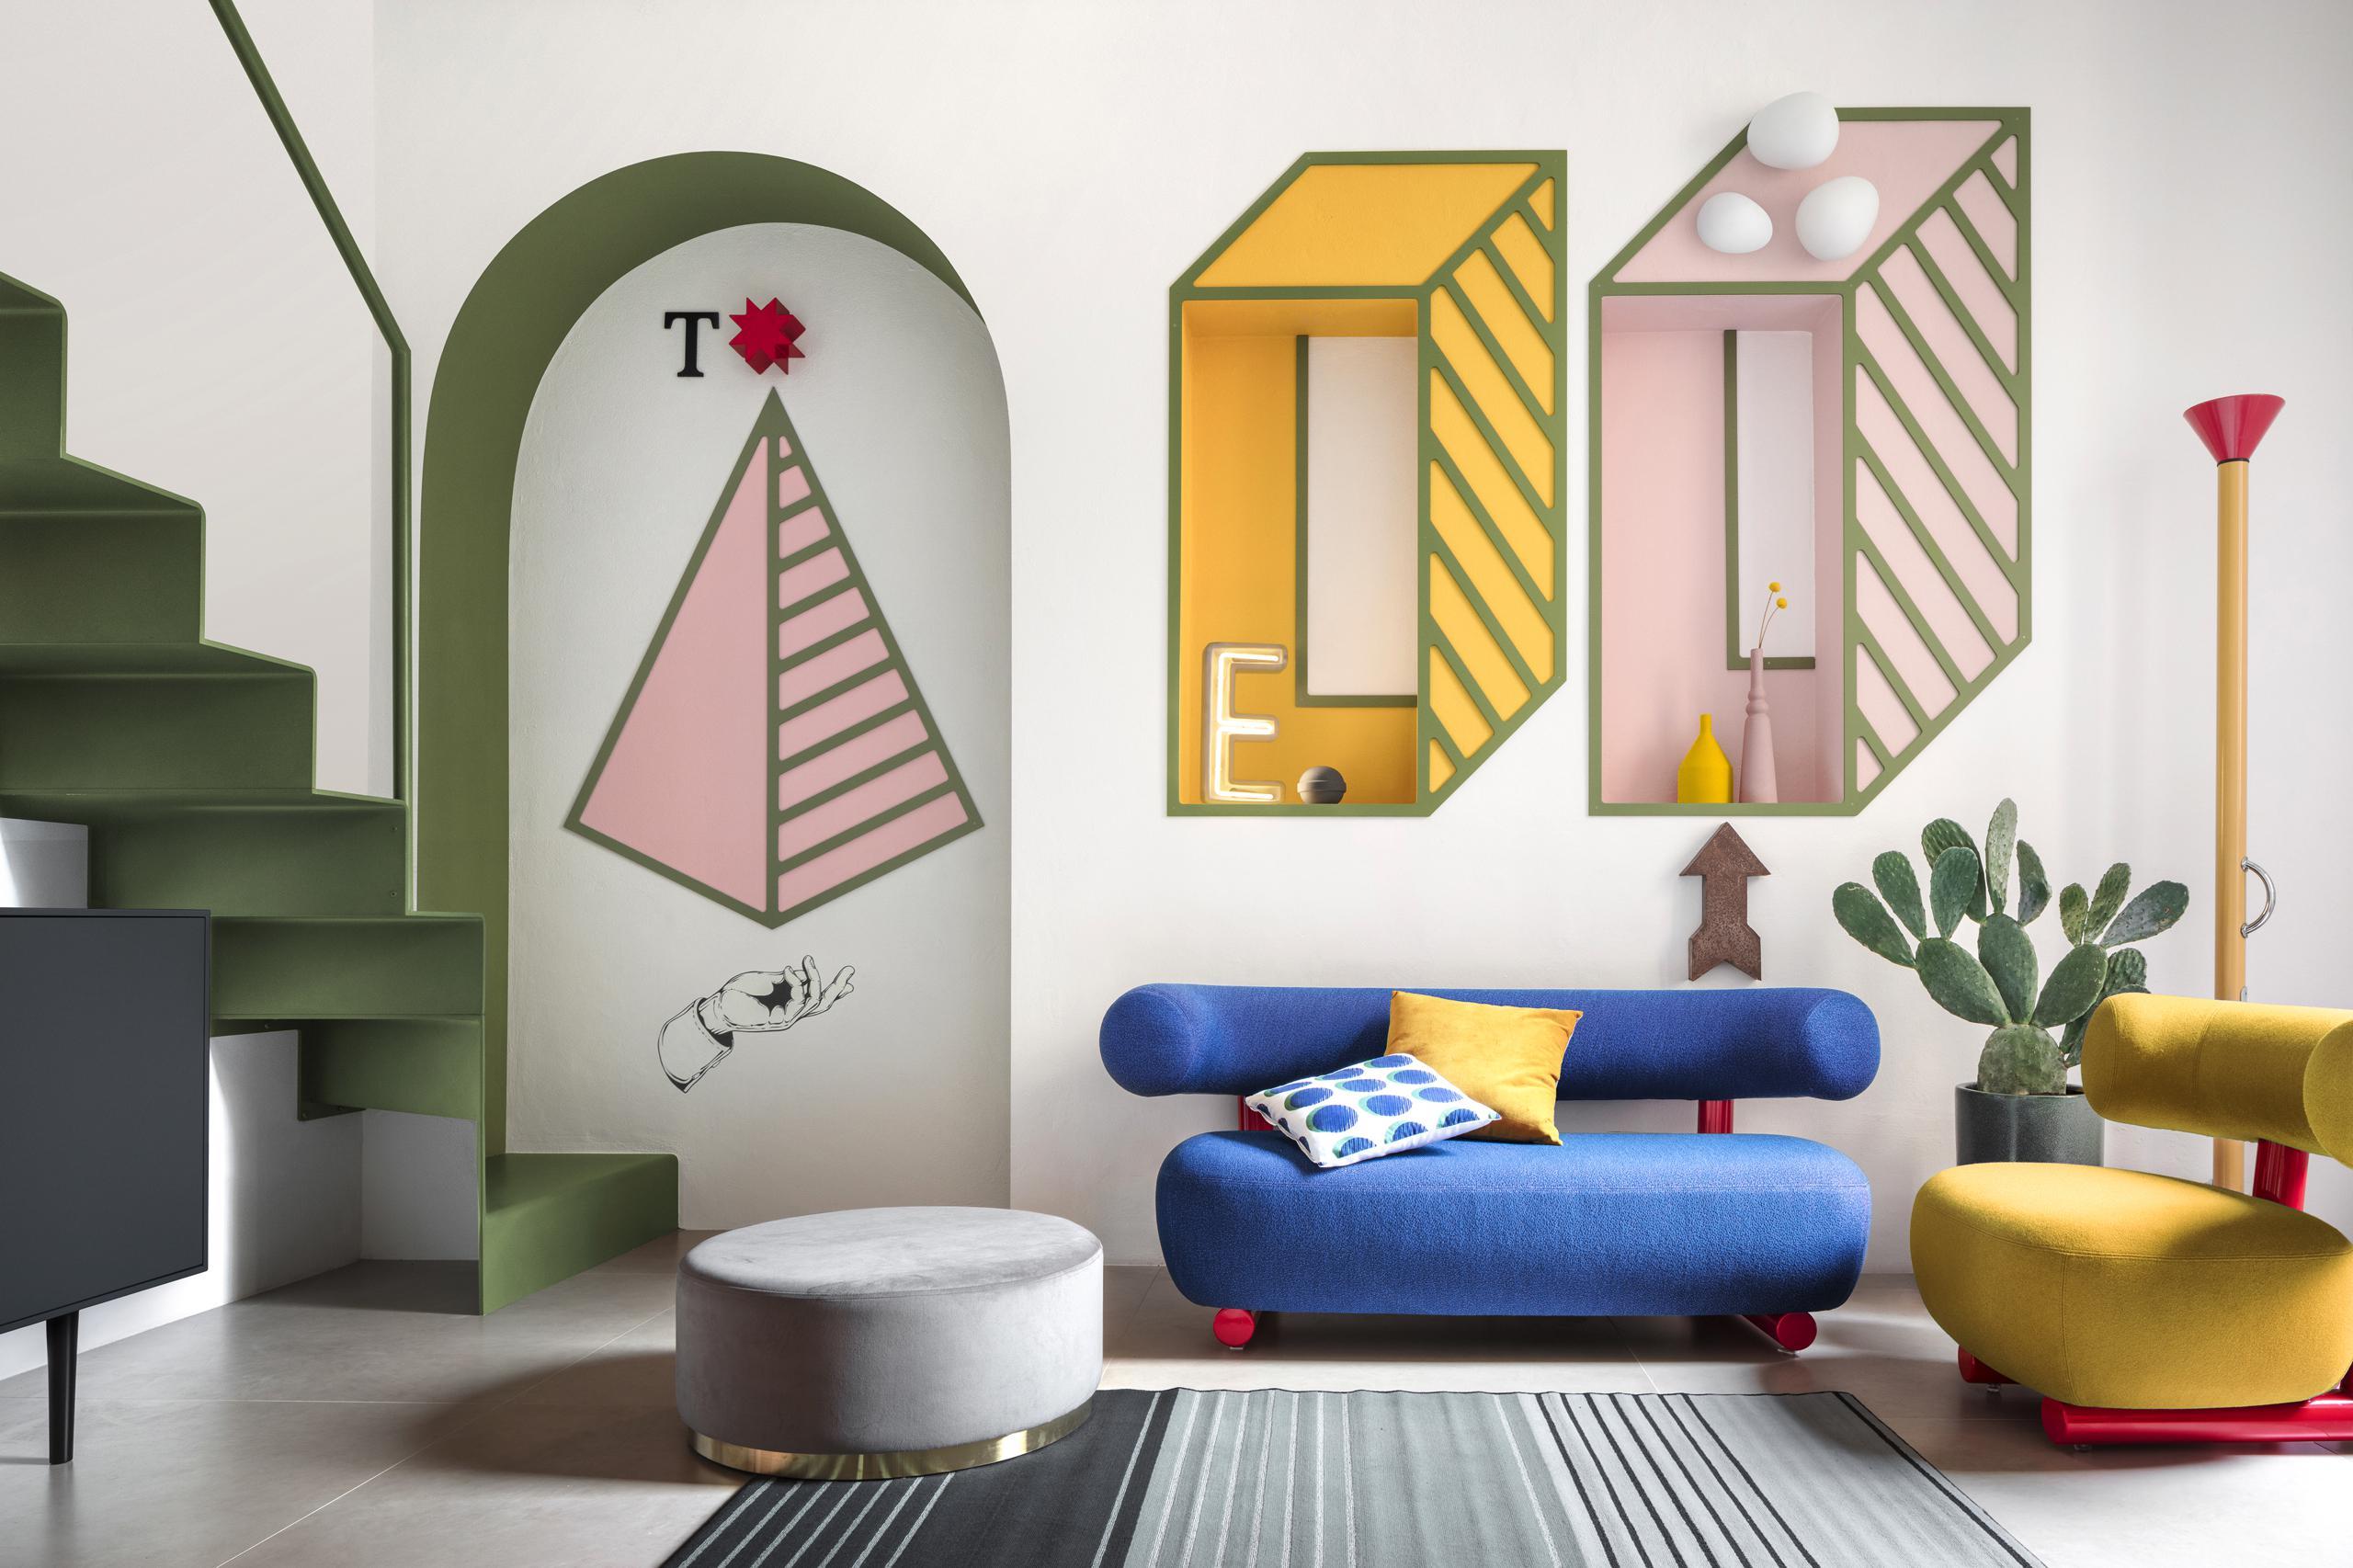 memphis_design-tribute-e.sottsass-studio-paradisiartificiali-decohome_7